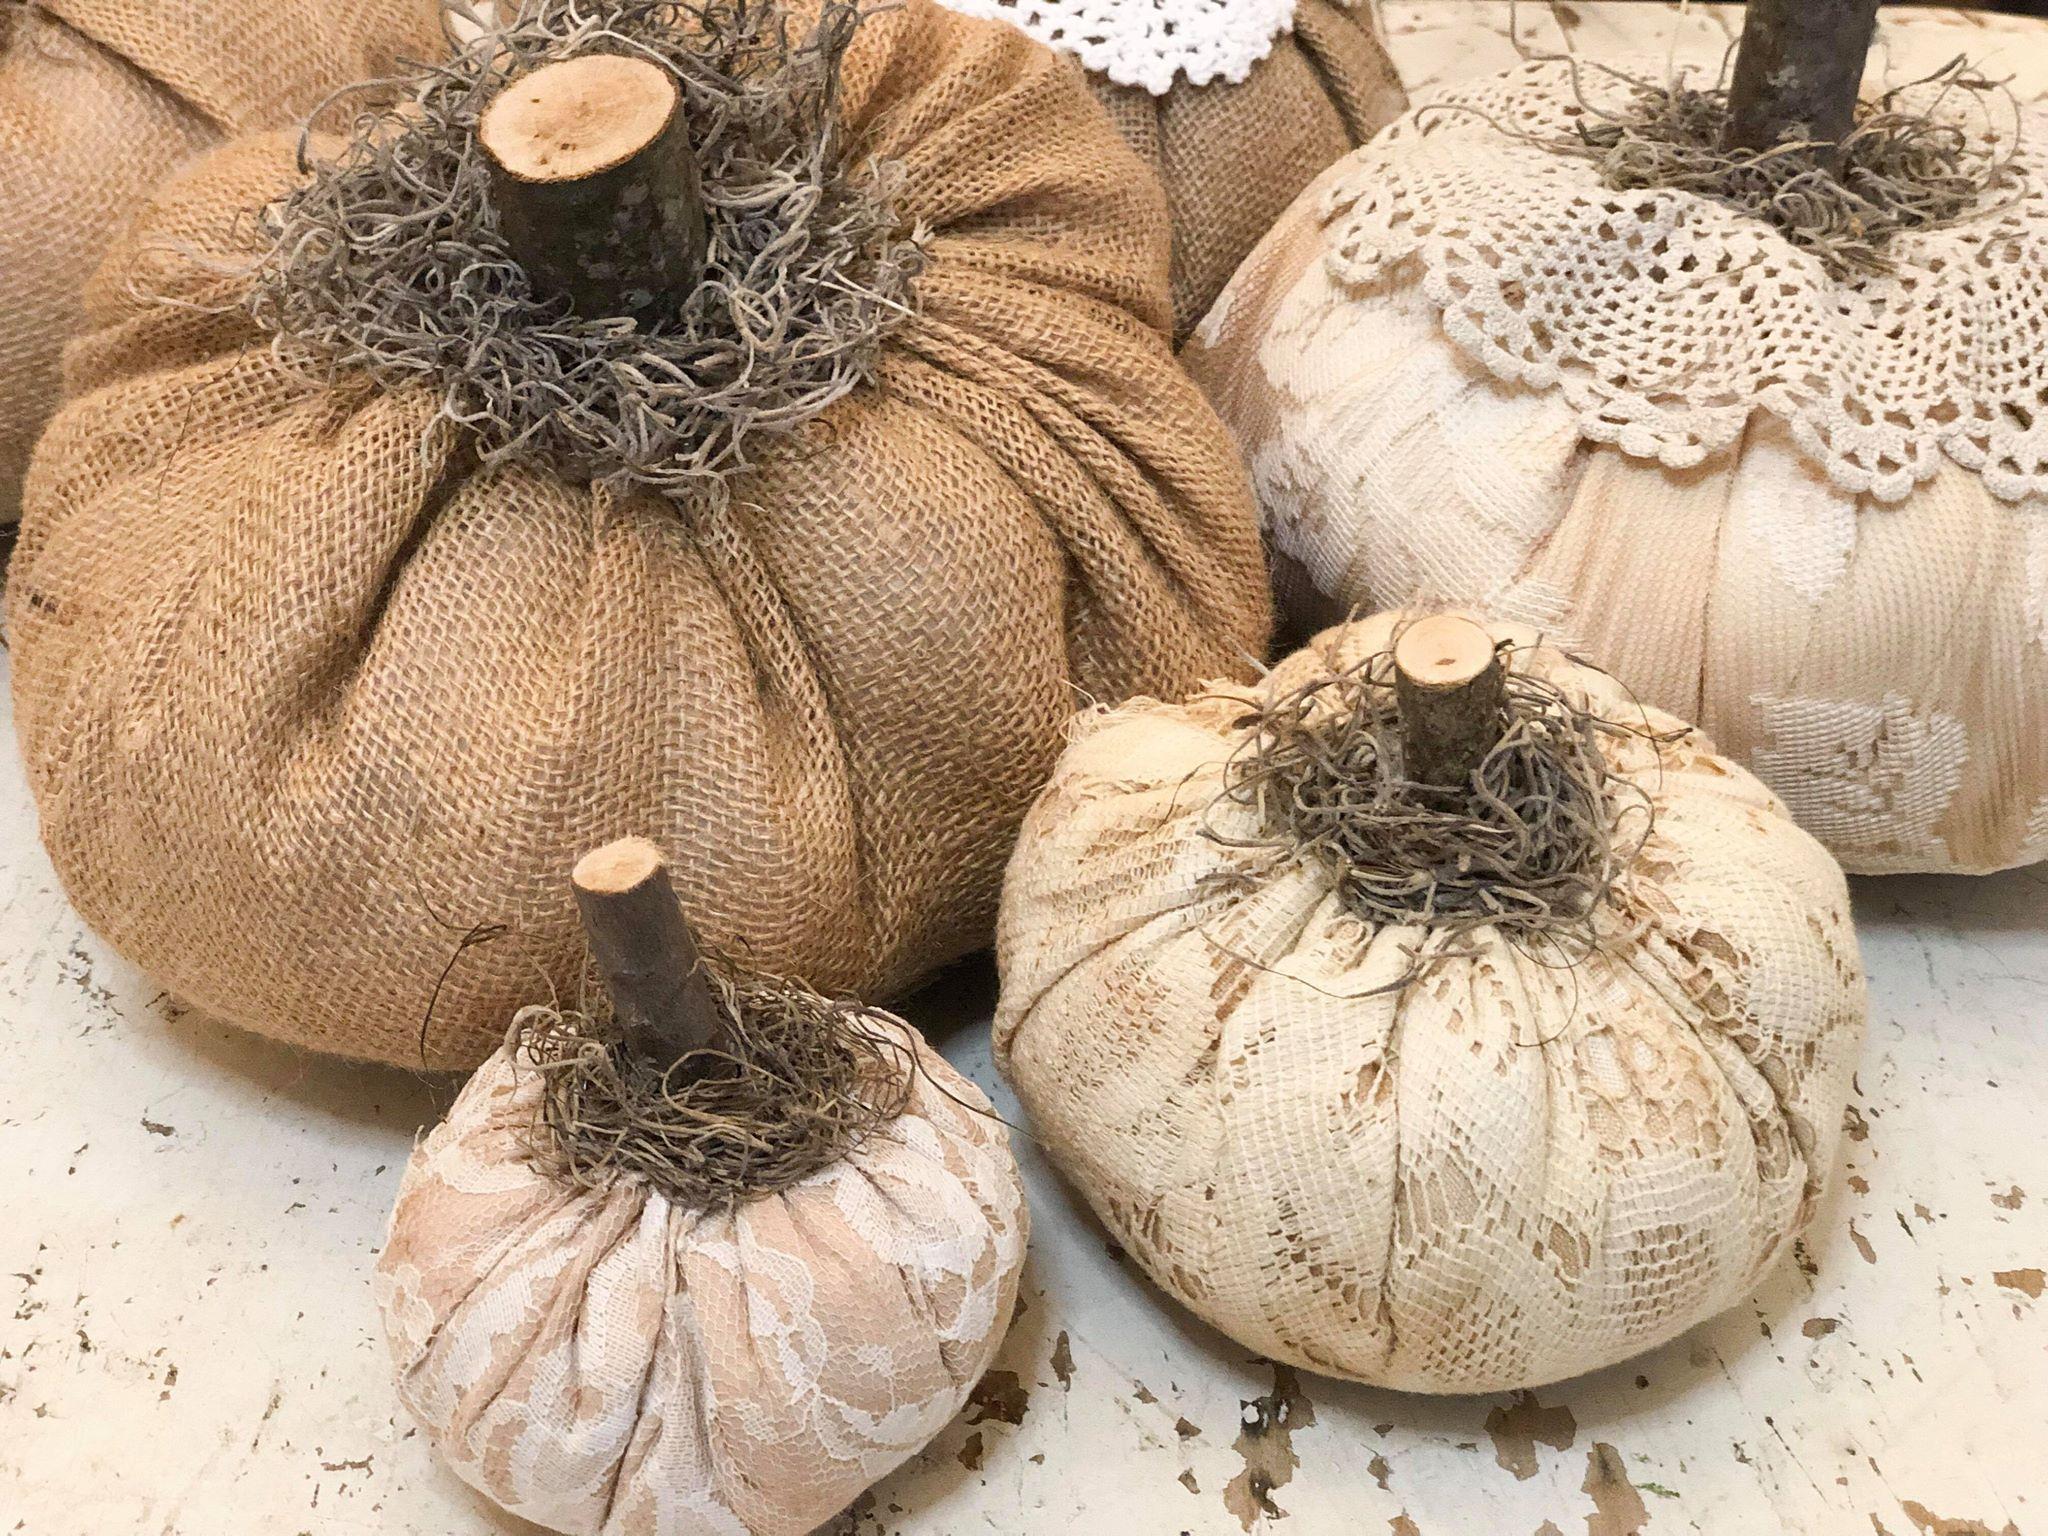 DIY Fabric Pumpkin - The Shabby Tree